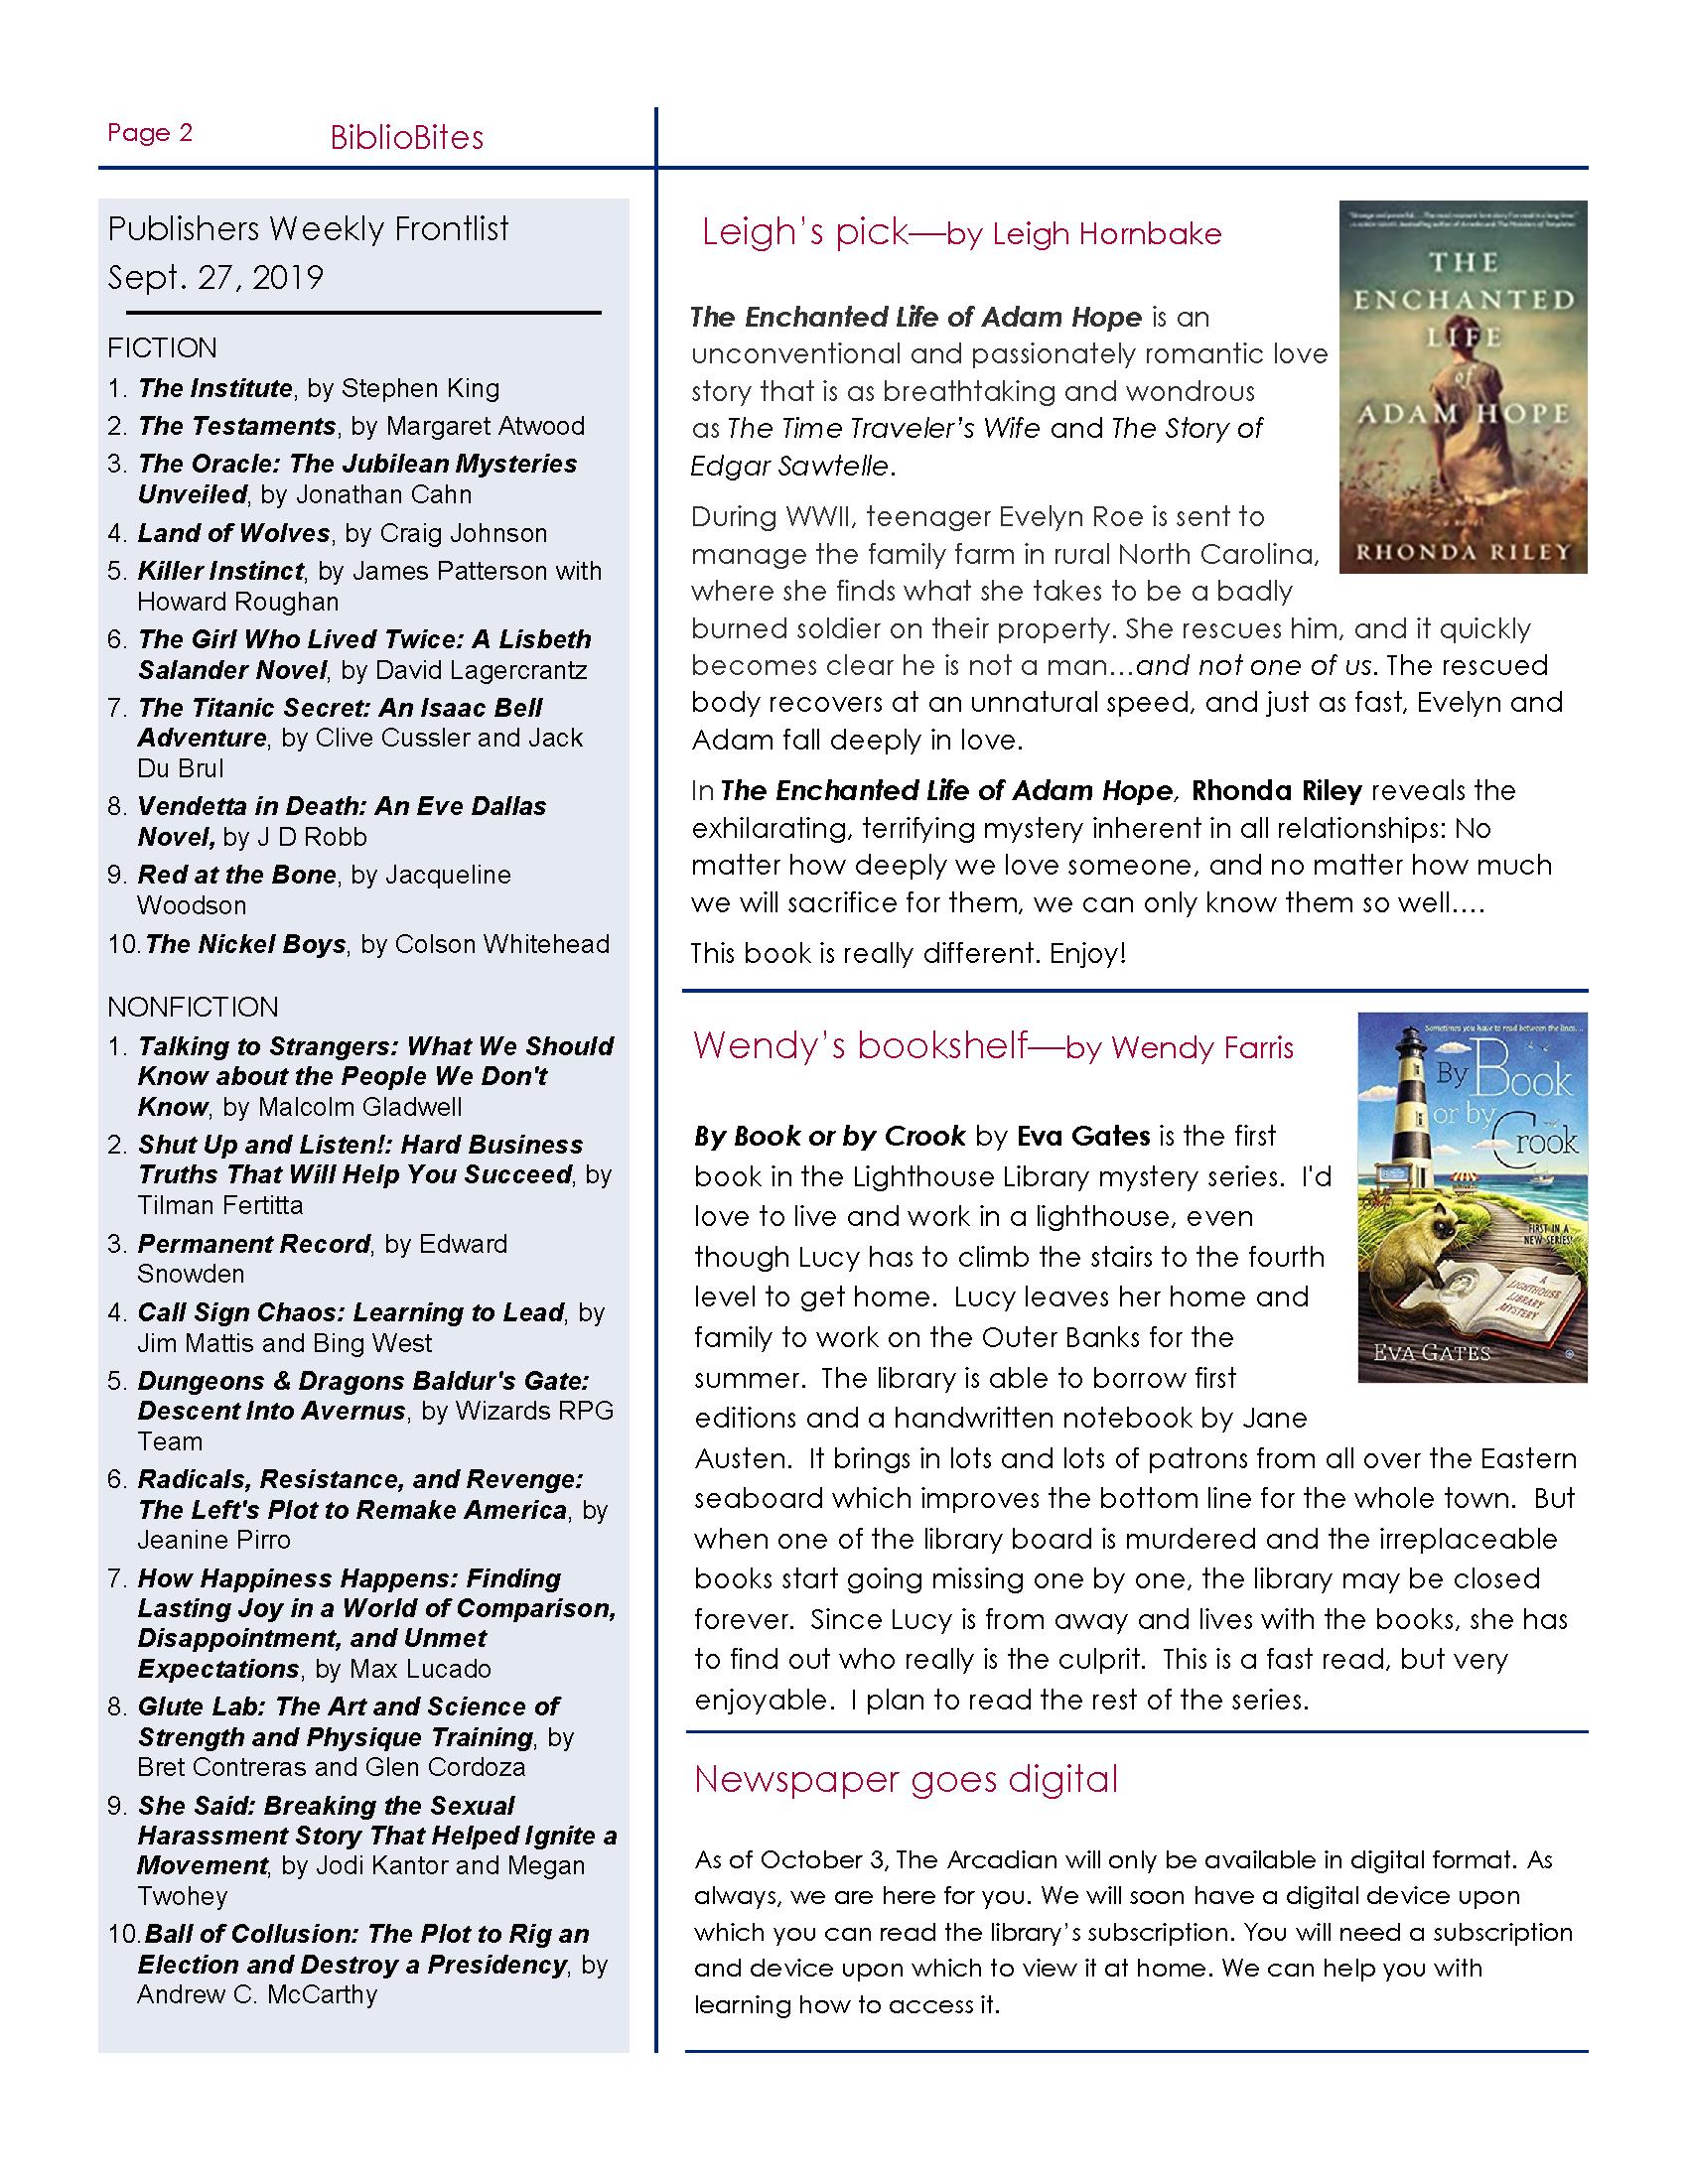 Okeechibee October 2019 newsletter